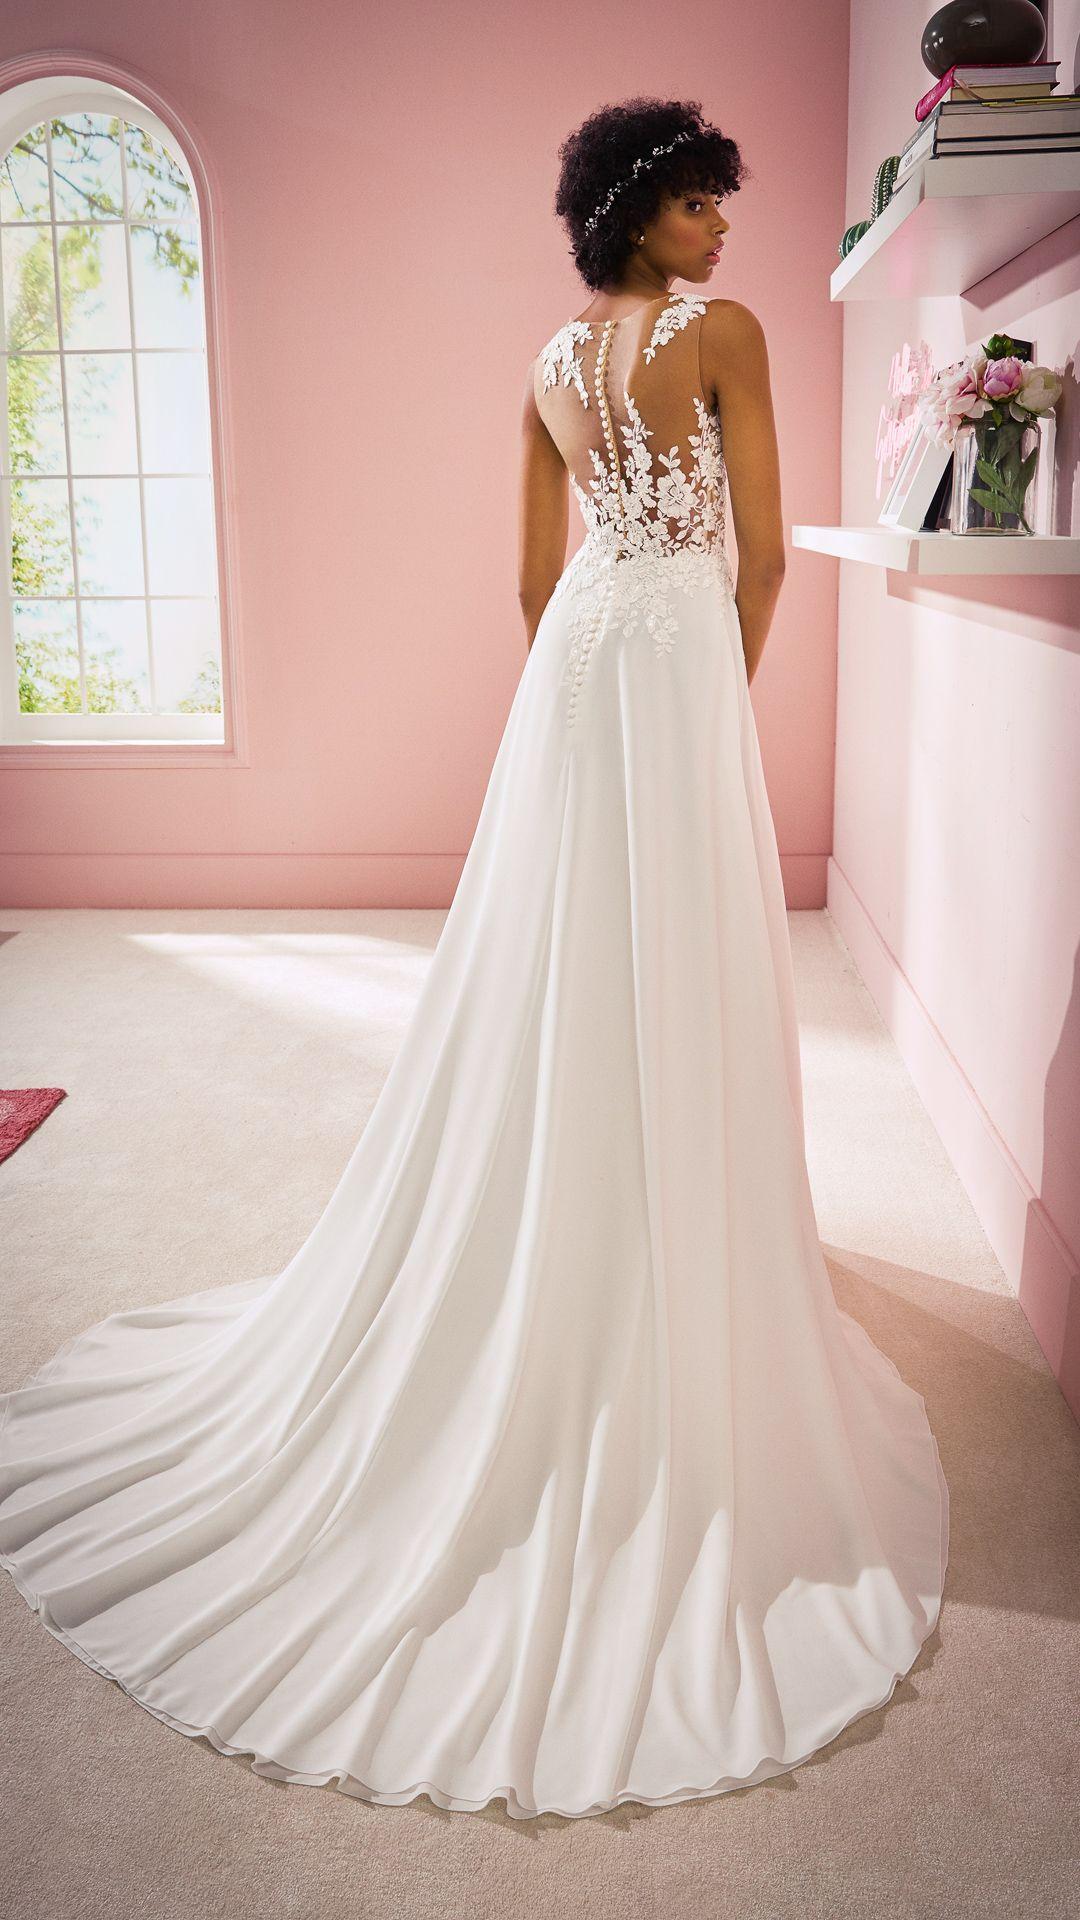 Wedding dresses 20 White One Collection Model: AMA-C #brutkleid